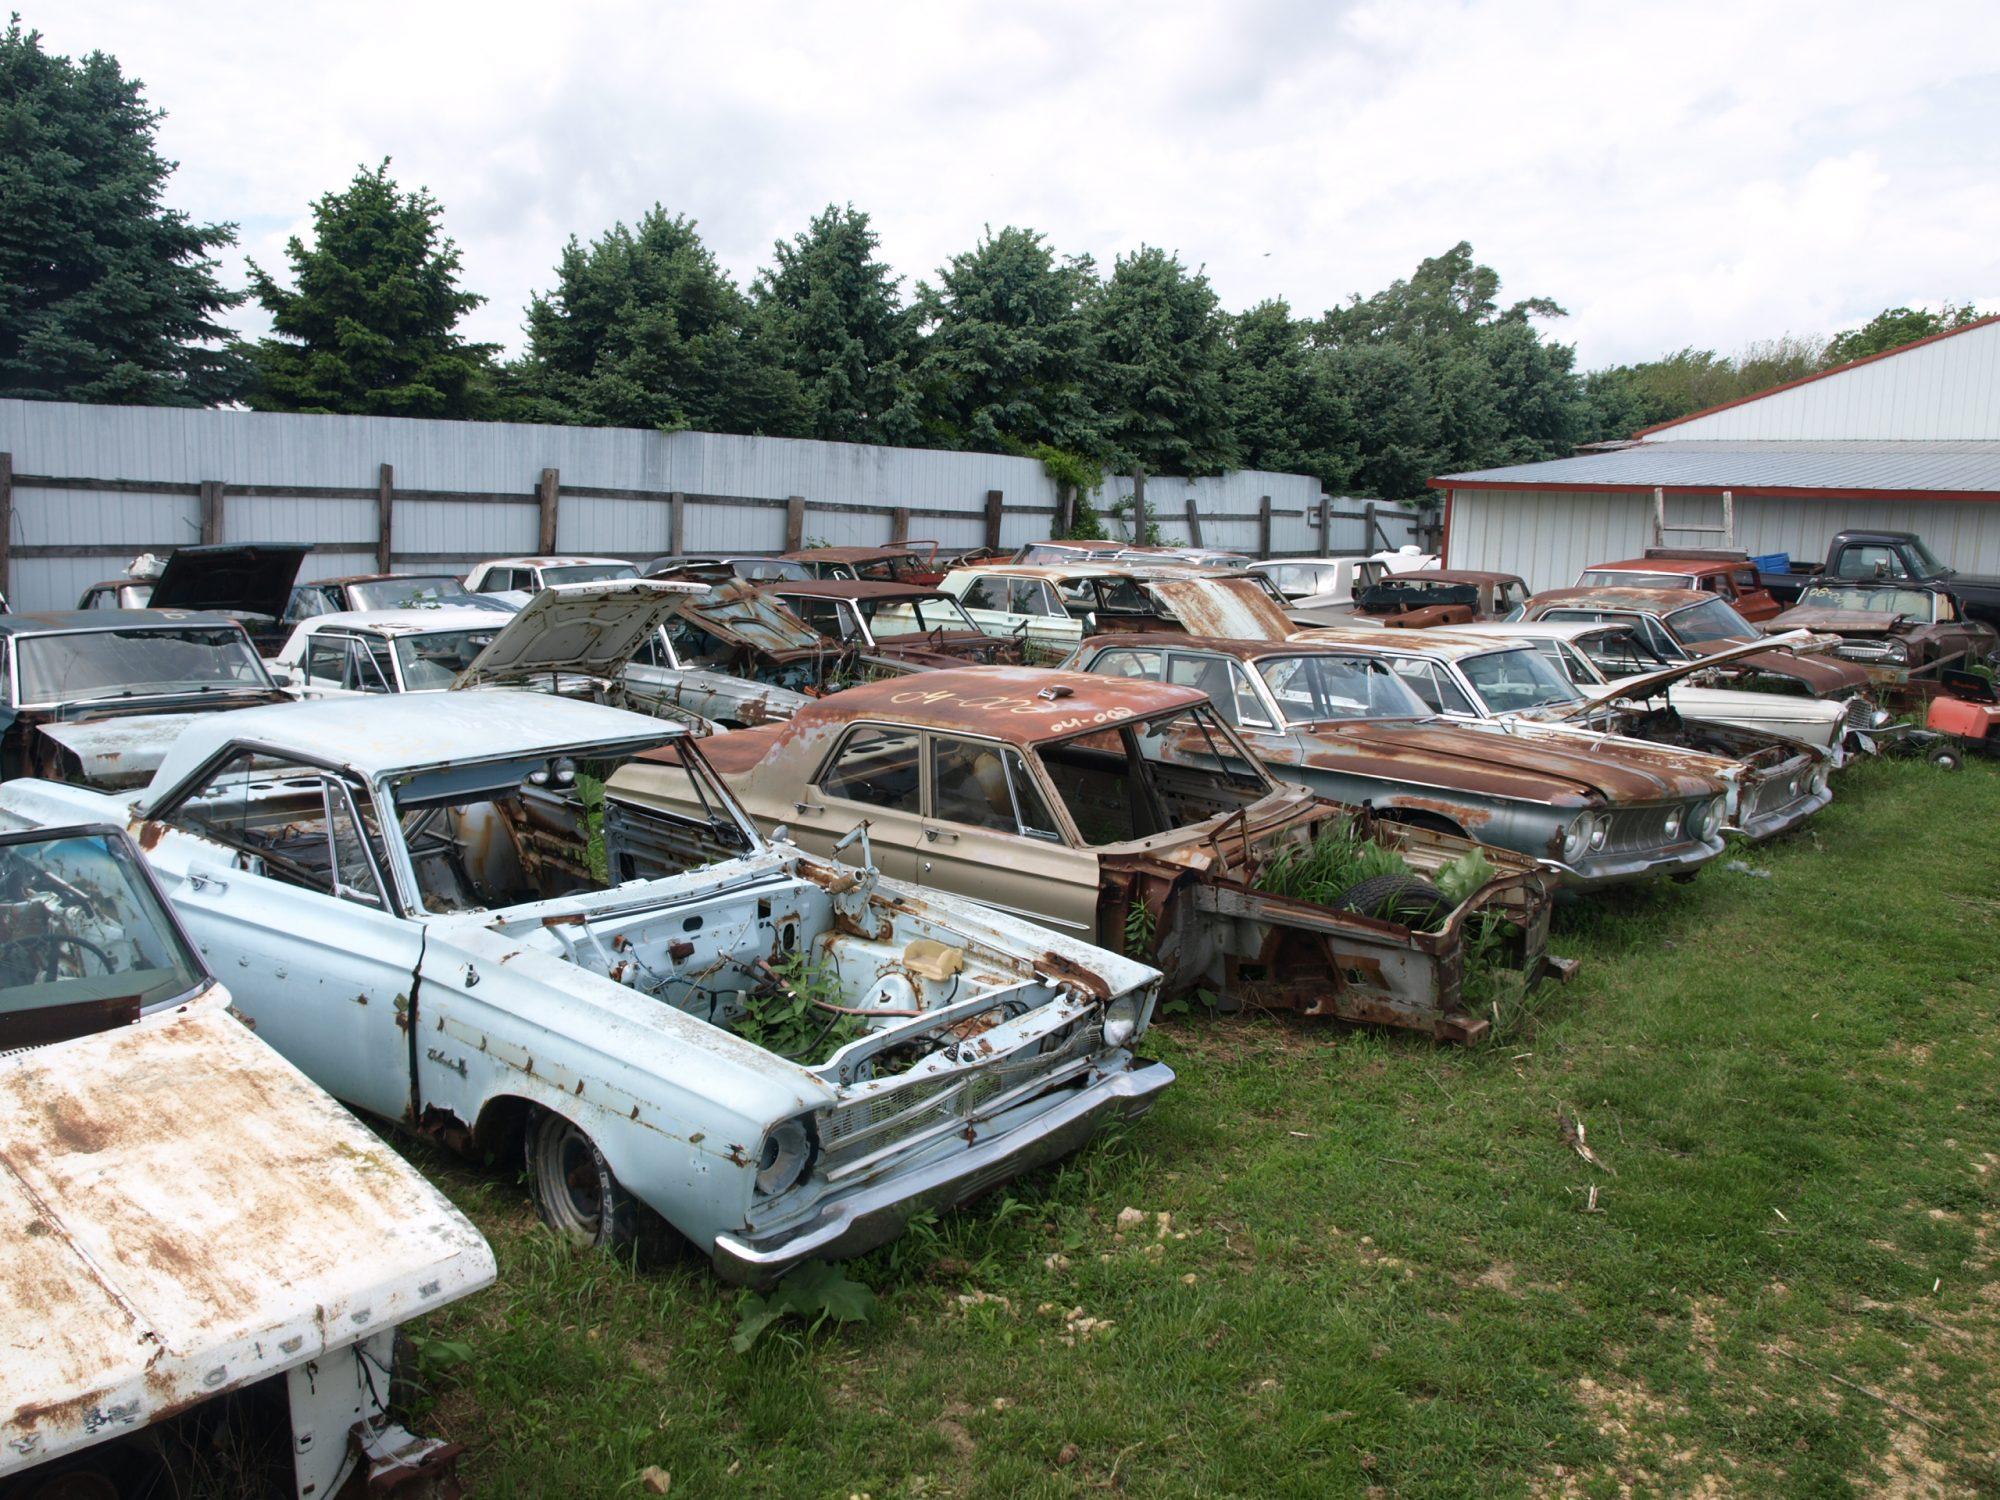 Classic Mopar vehicles sitting in a field at Mopar City